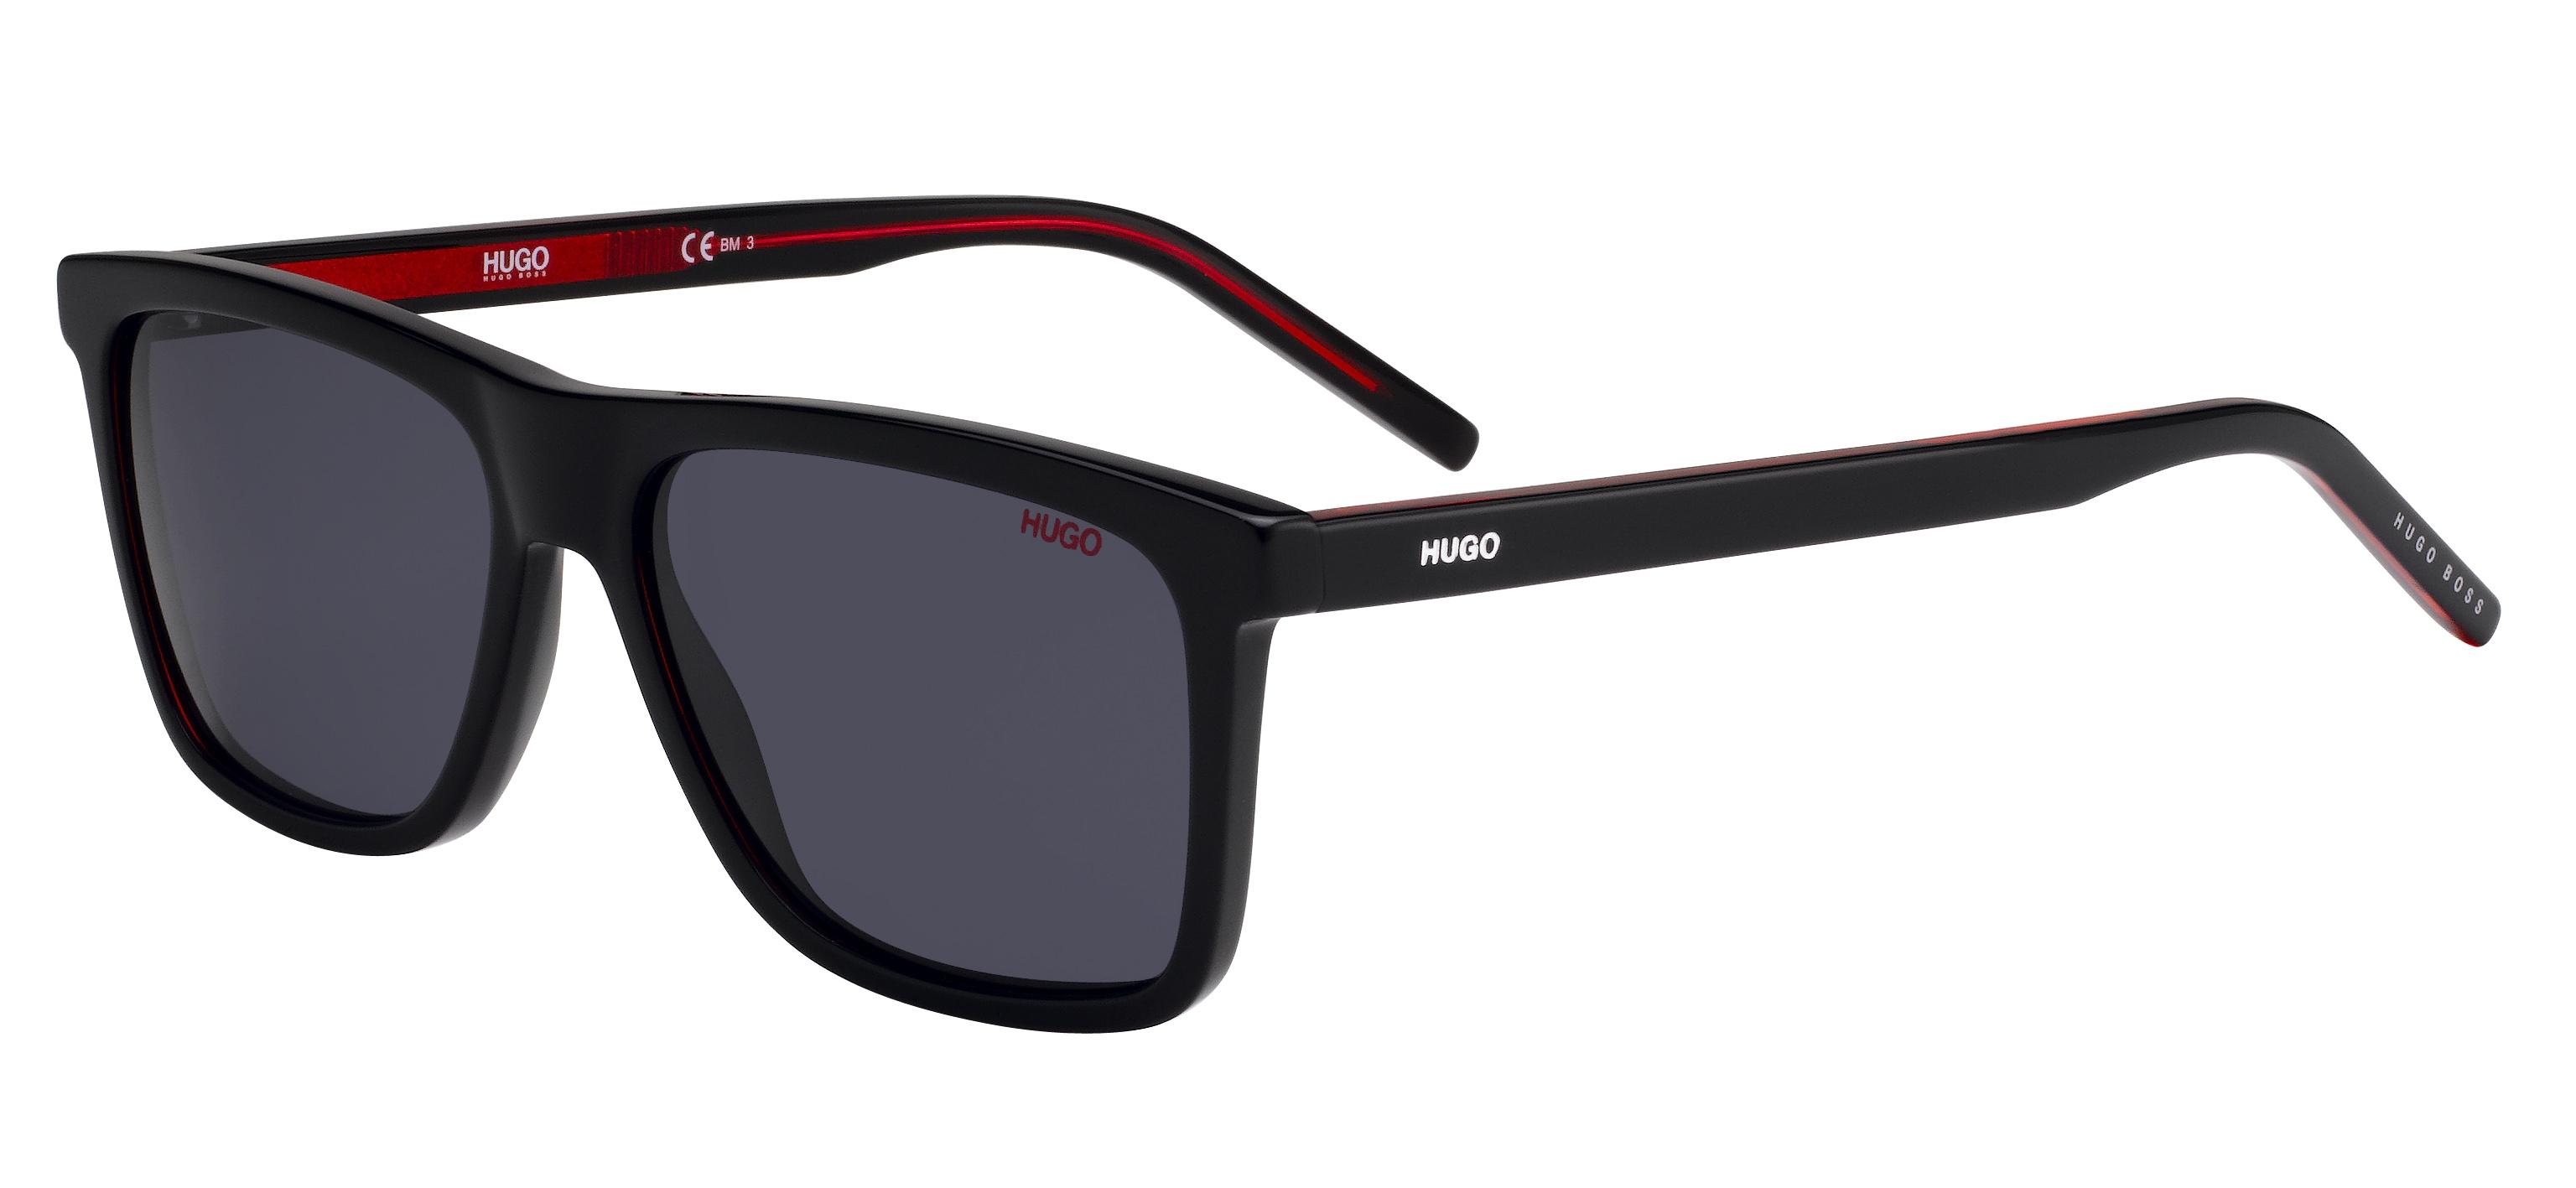 5fefc4521b Hugo Boss Sunglasses